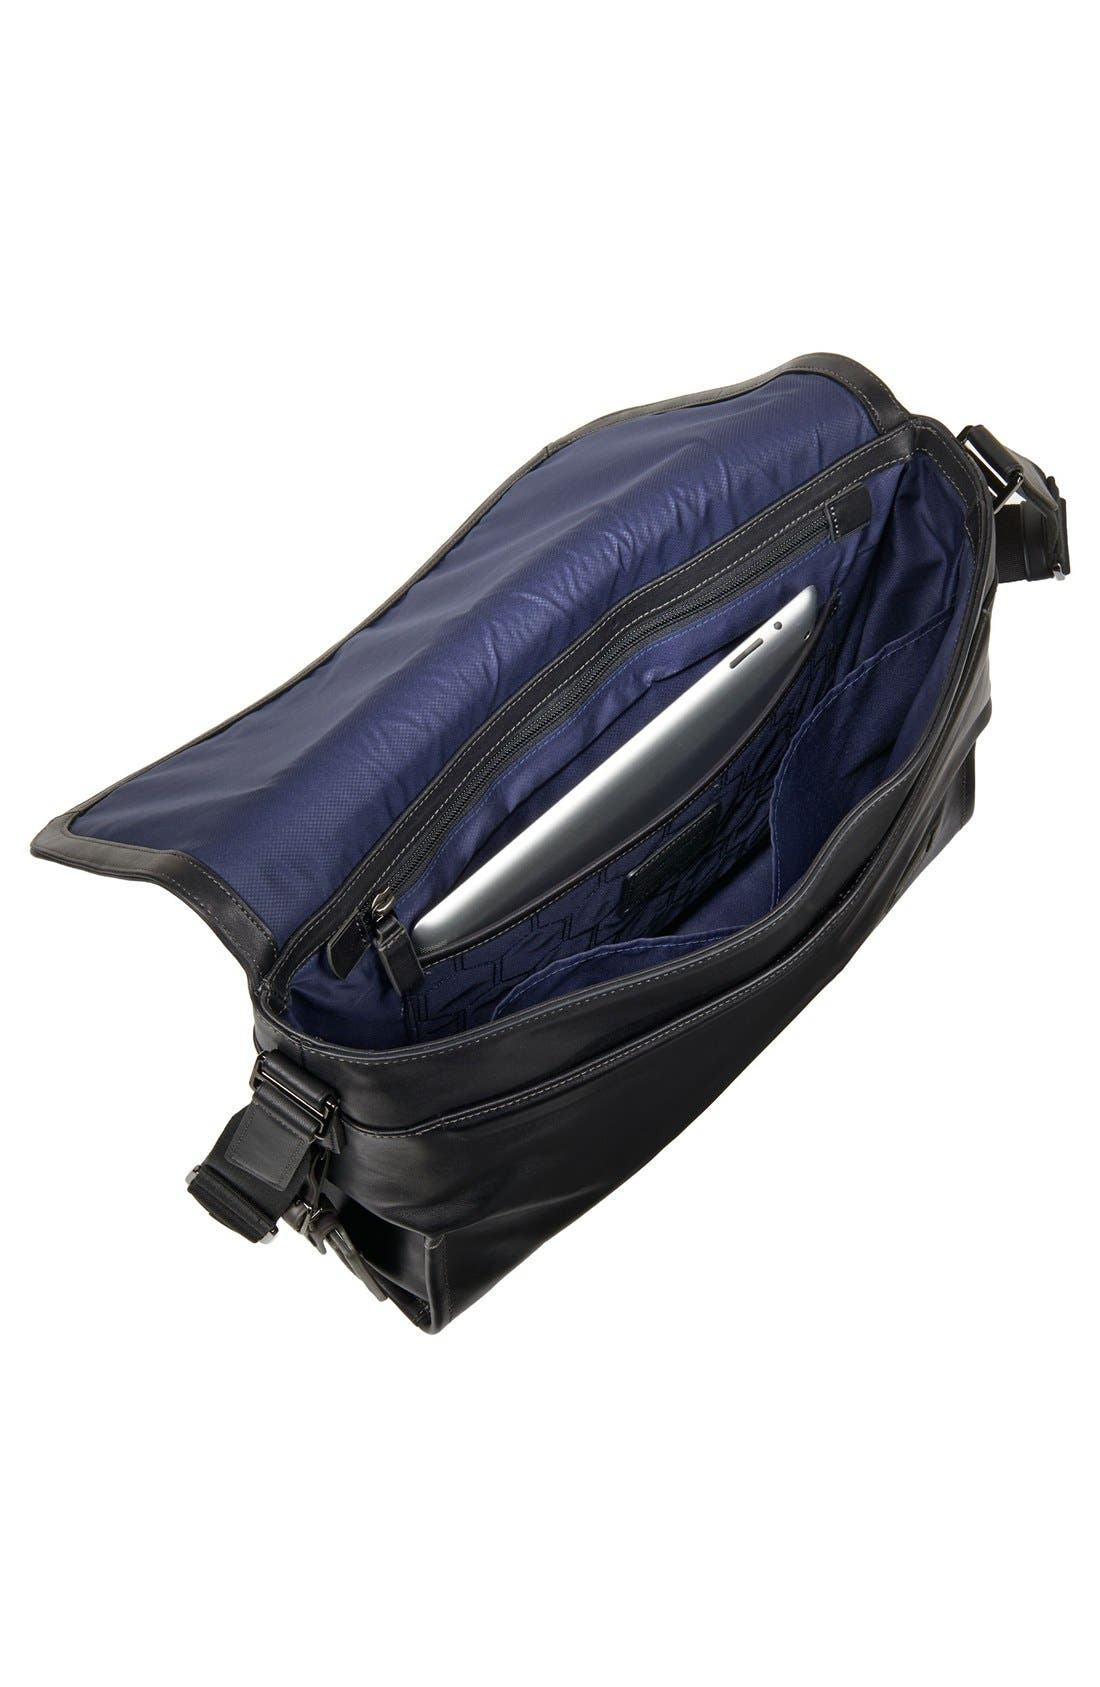 'Harrison - Mathews' Messenger Bag,                             Alternate thumbnail 5, color,                             001